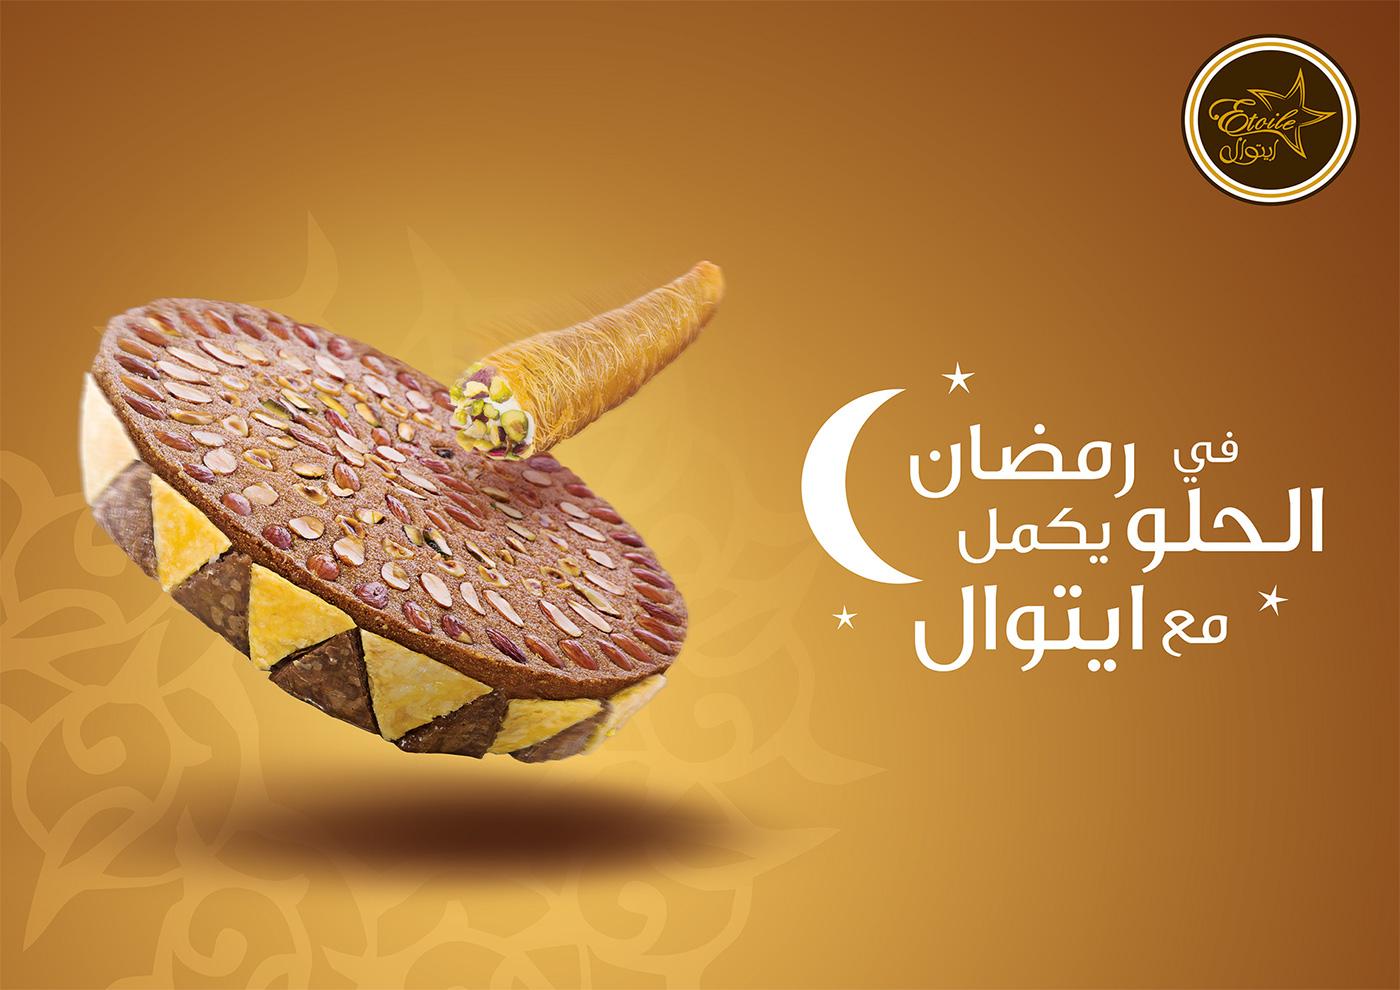 affiche-etoile-ramadan